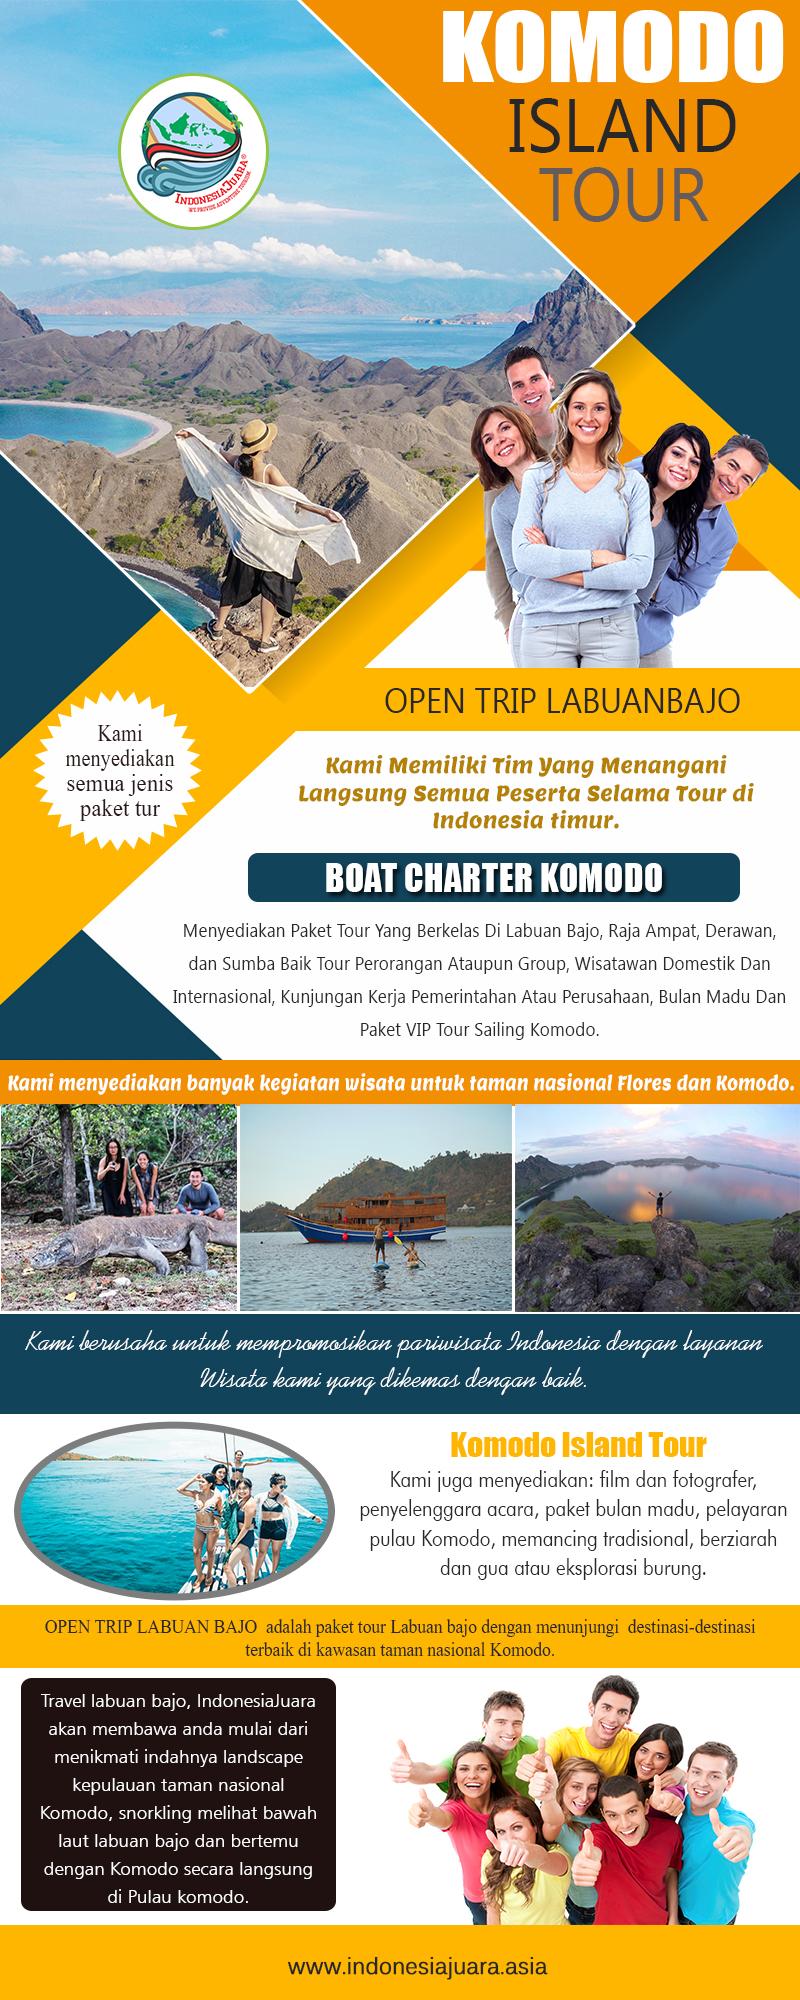 Komodo Island Labuanbajo | indonesiajuara.asia